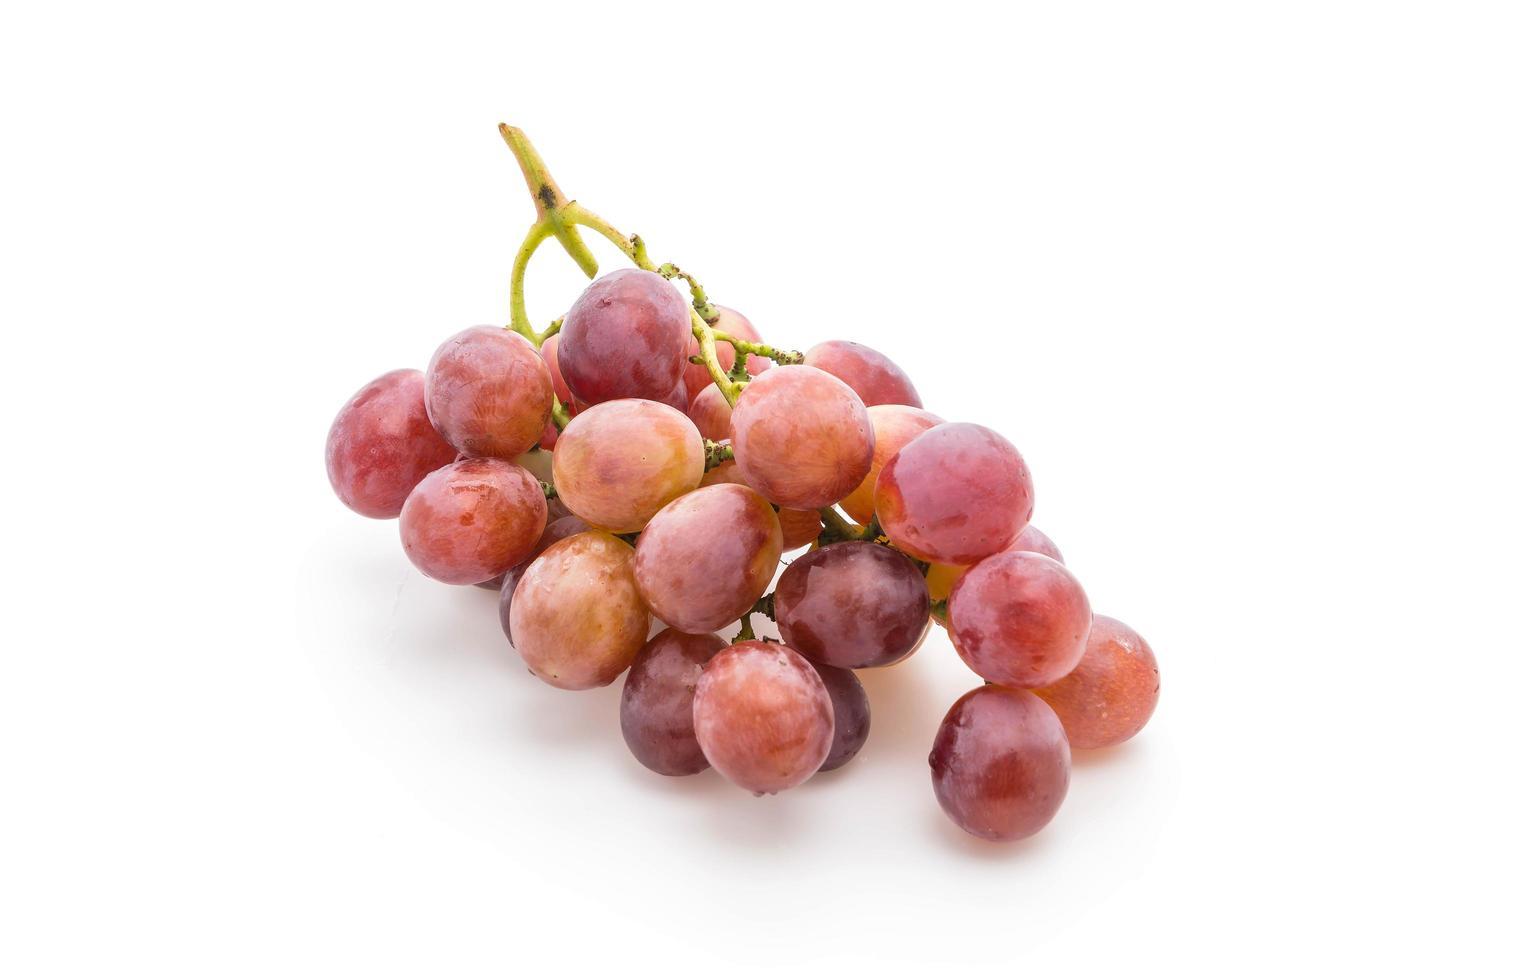 rode druiven op witte achtergrond foto